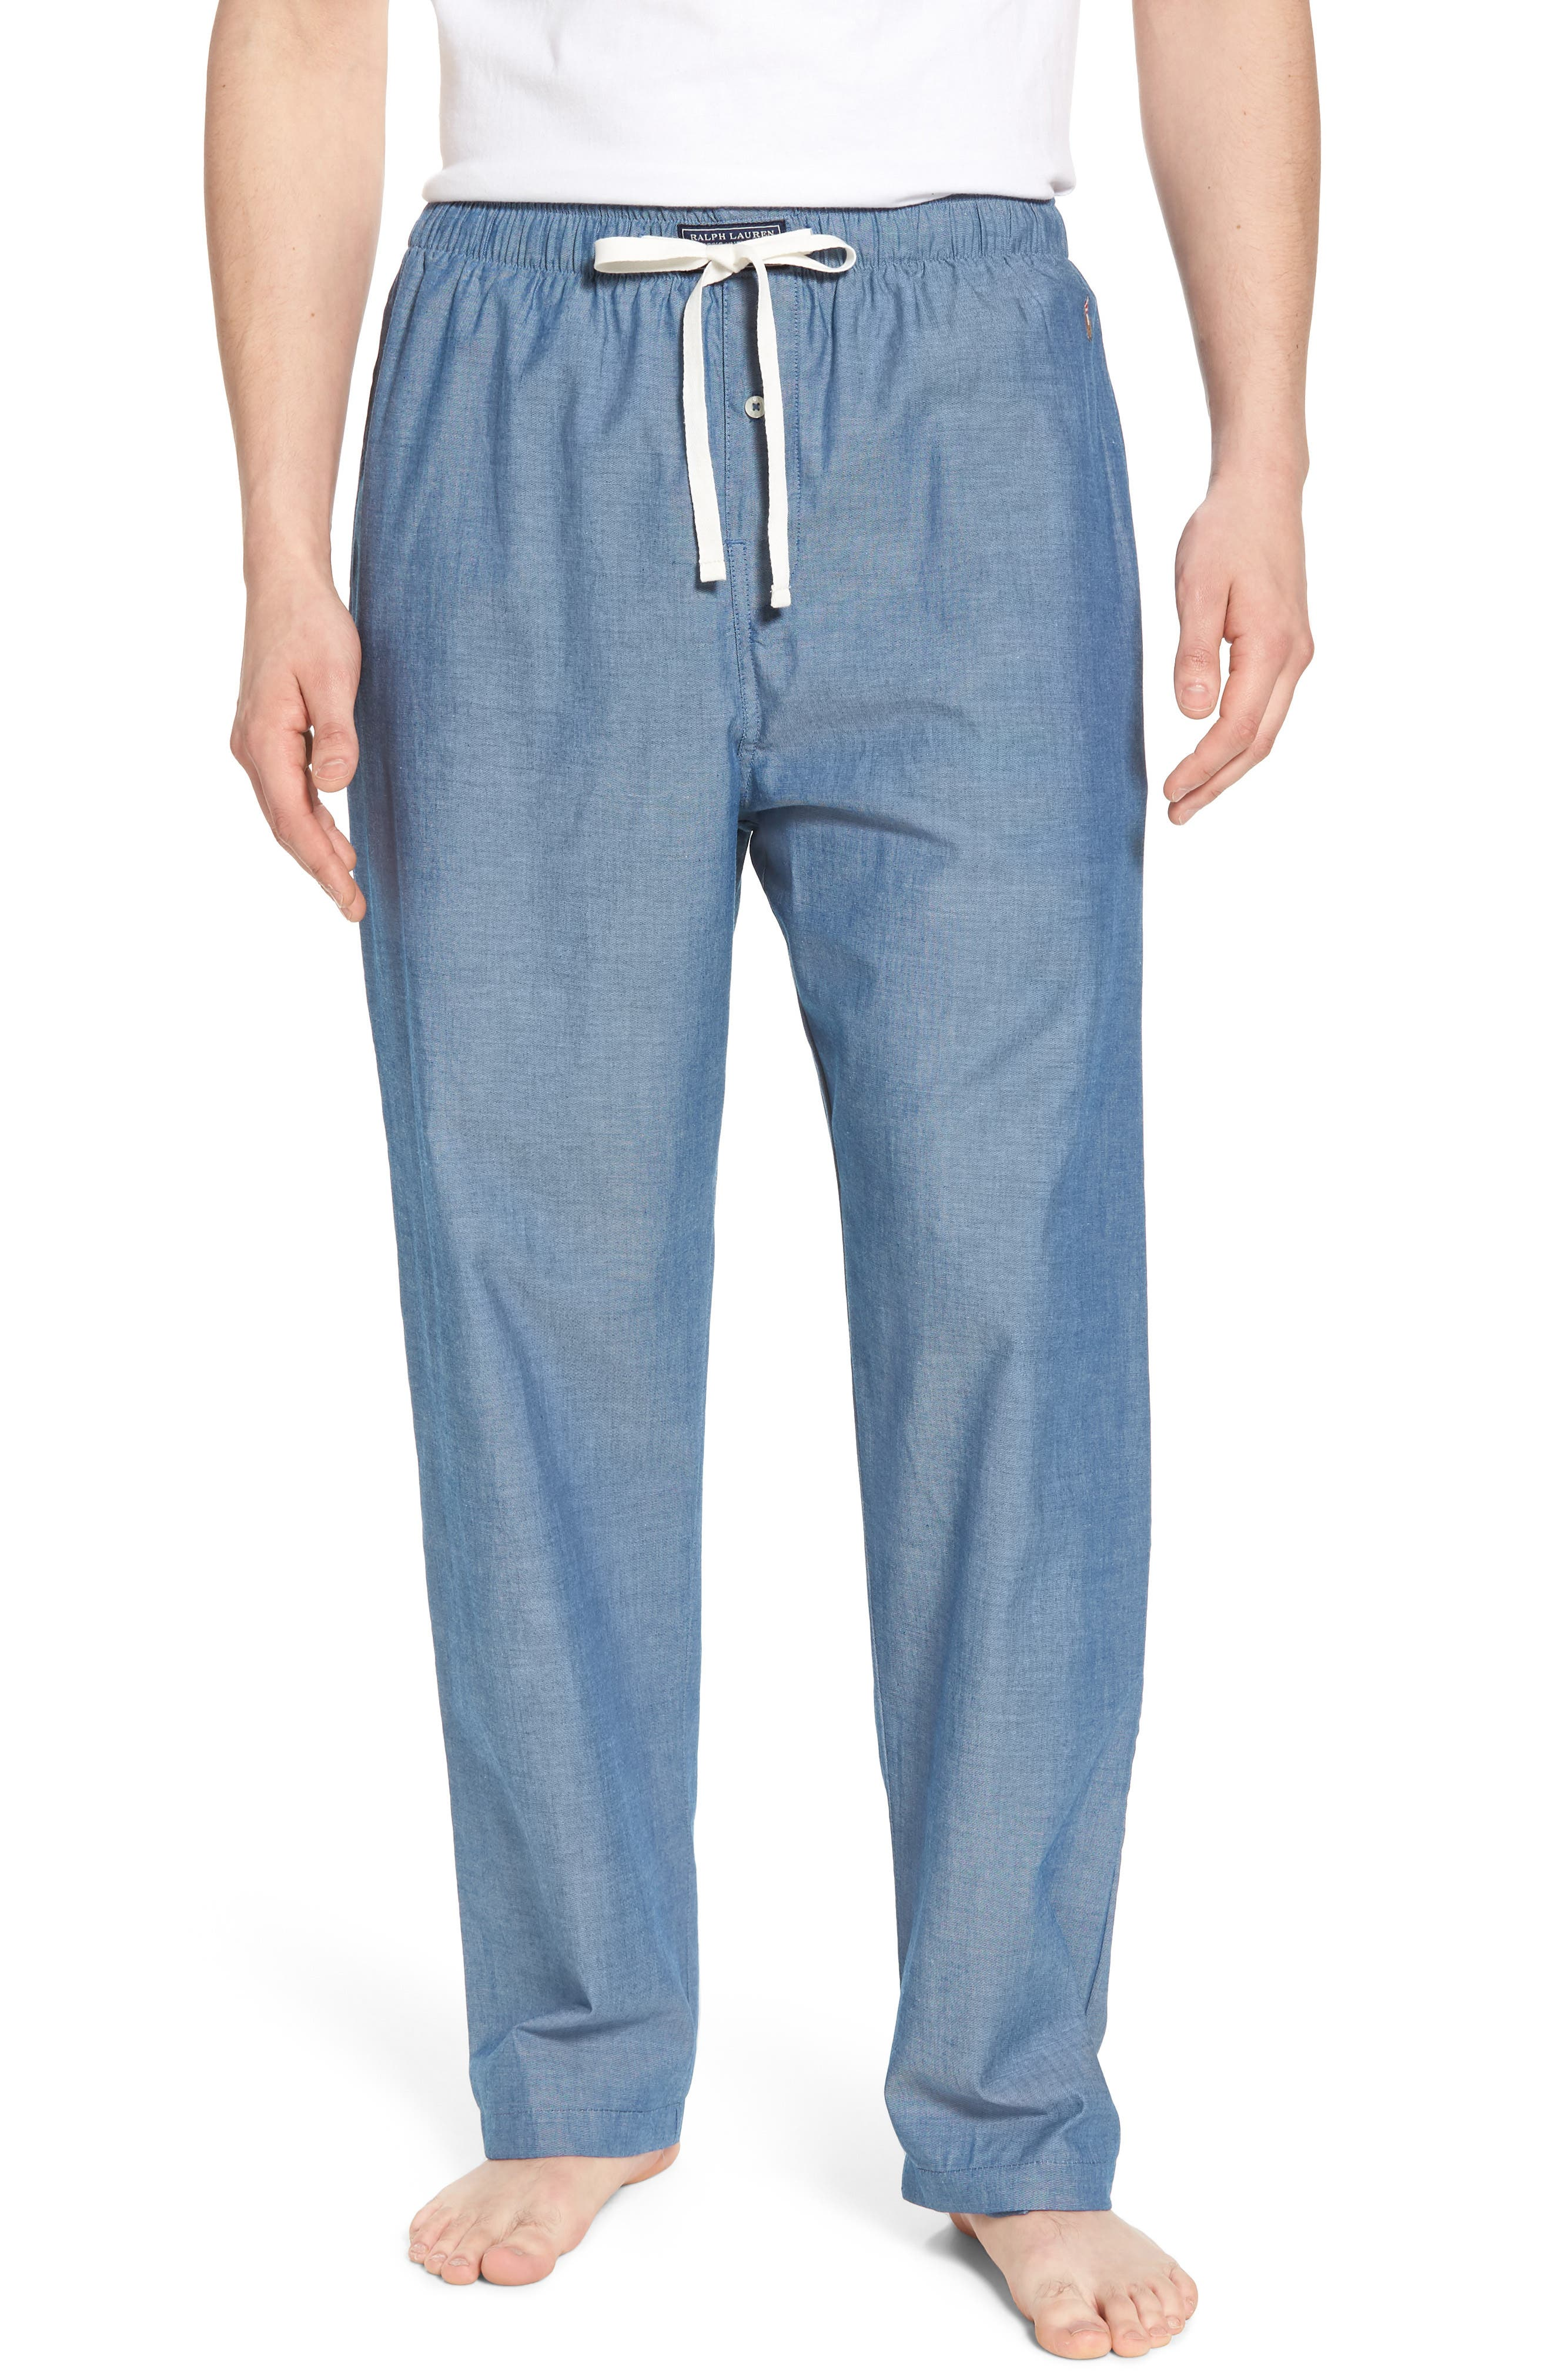 Chambray Woven Lounge Pants,                             Main thumbnail 1, color,                             Medium Indigo/ Dark Indigo